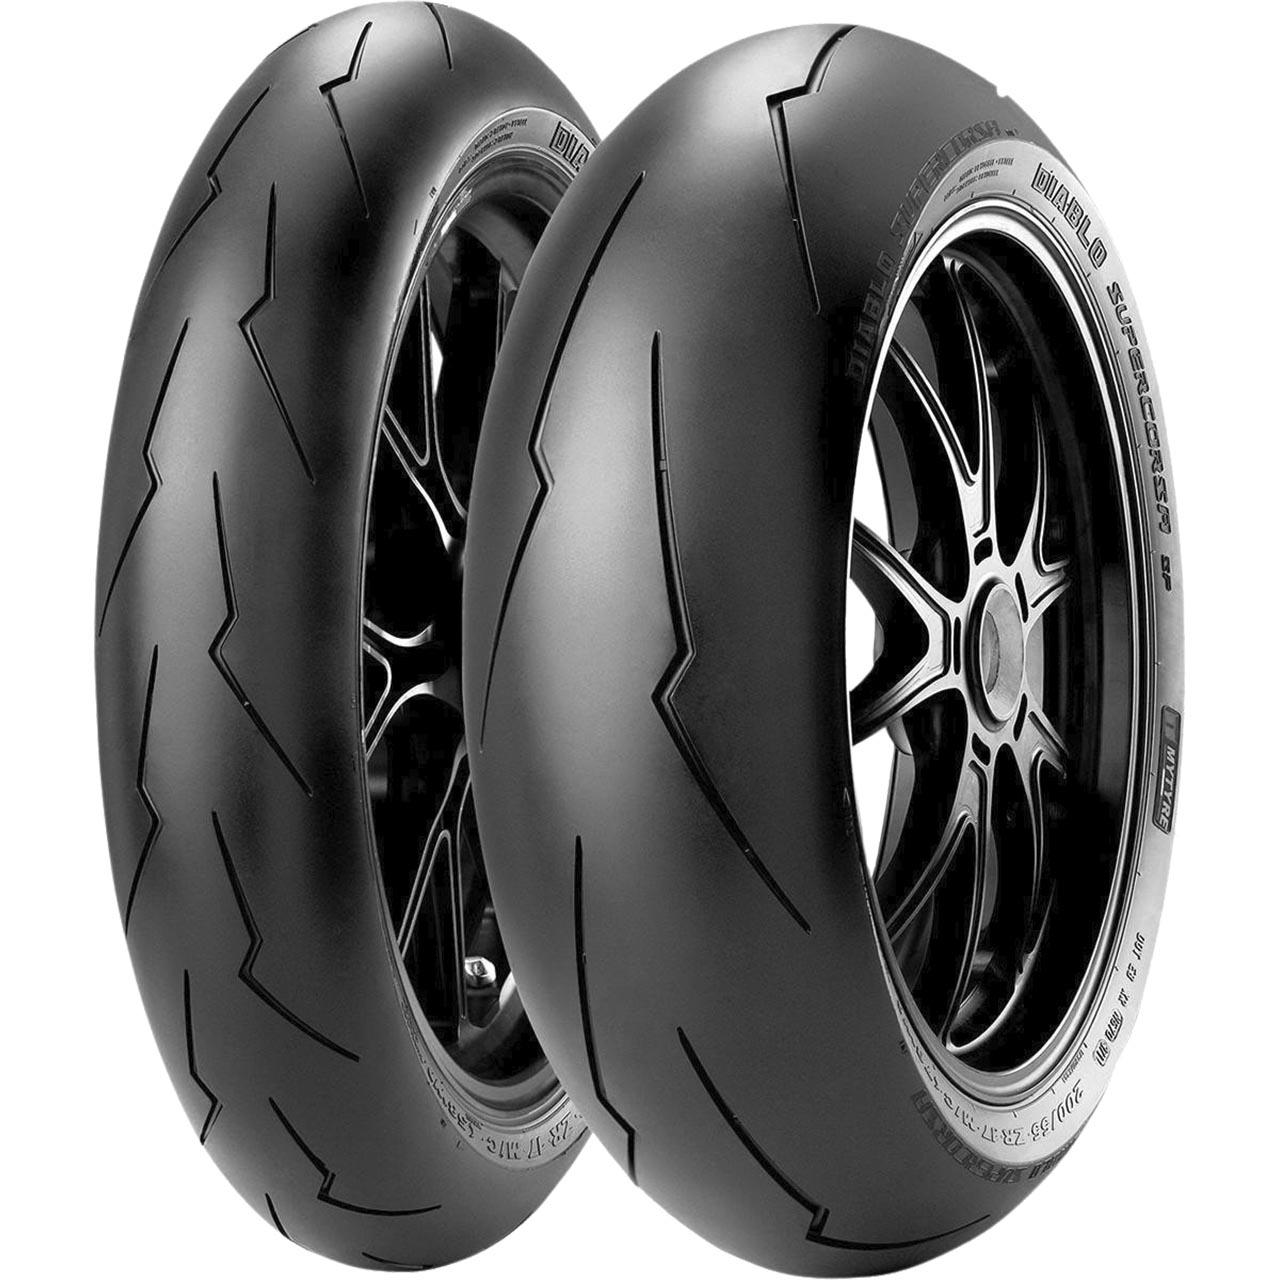 Pirelli Diablo Supercorsa V3 SP Rear 200/60ZR17 M/C (80W) TL